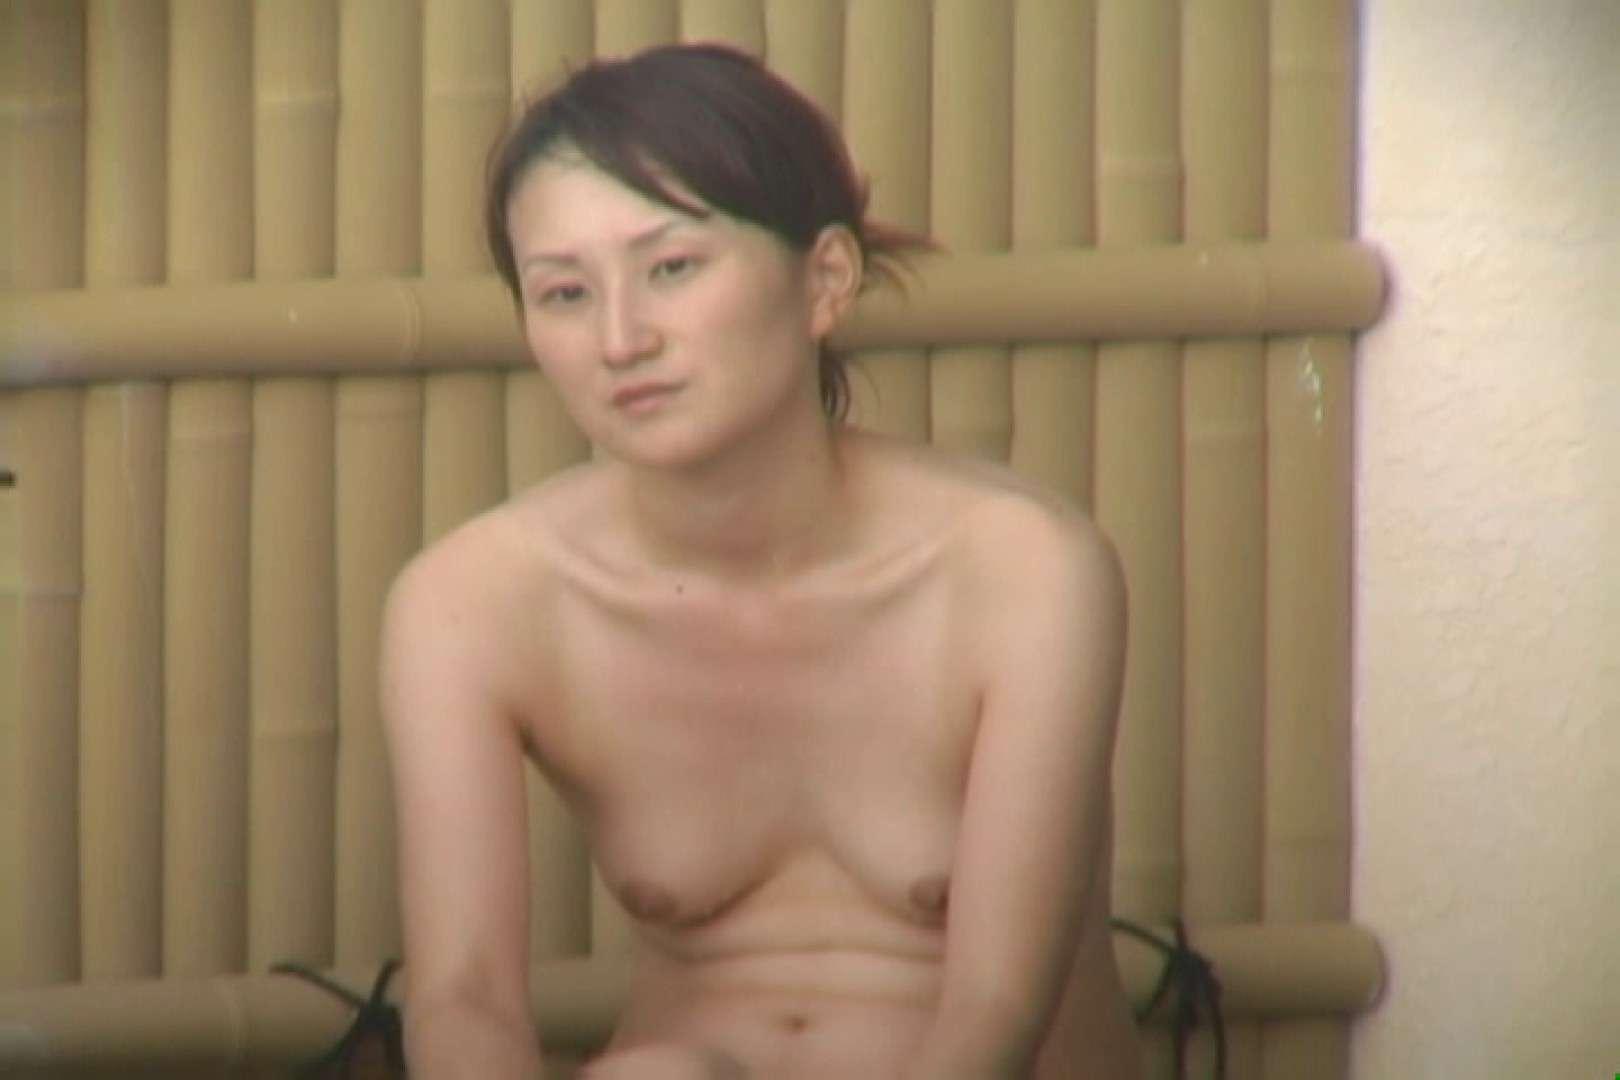 Aquaな露天風呂Vol.578 OL女体 われめAV動画紹介 77連発 47